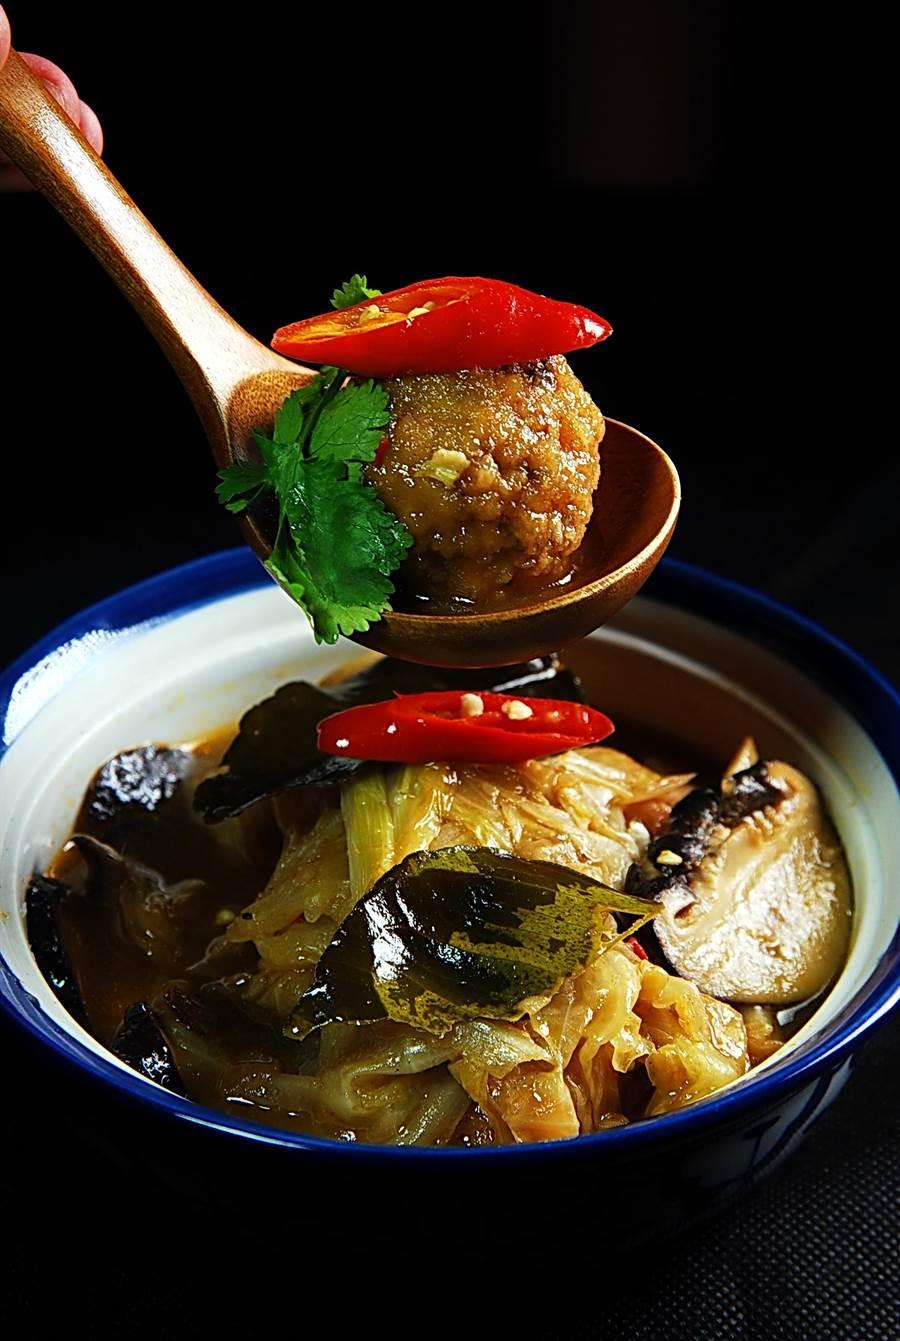 〈Green Room〉最新研發的菜式〈獅子頭〉,是用馬鈴薯、胡蘿蔔、豆腐泥、玉米粉和麵粉作成丸子,再與泰式酸辣湯煨煮而成。(圖/姚舜攝)